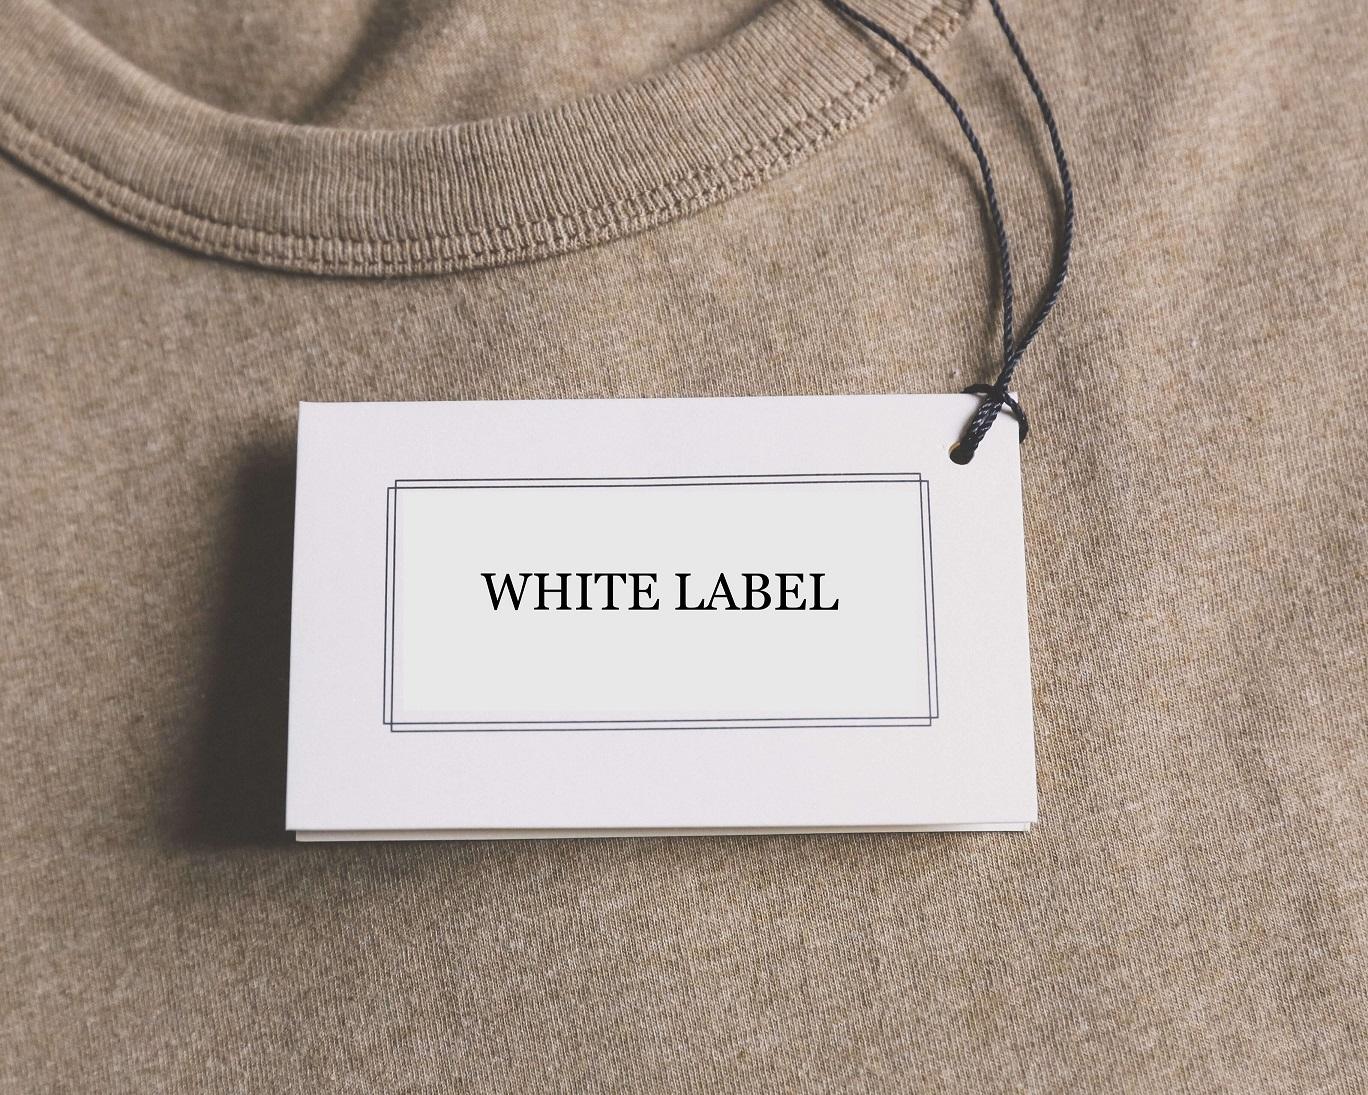 White Label: Splendid way of business optimisation